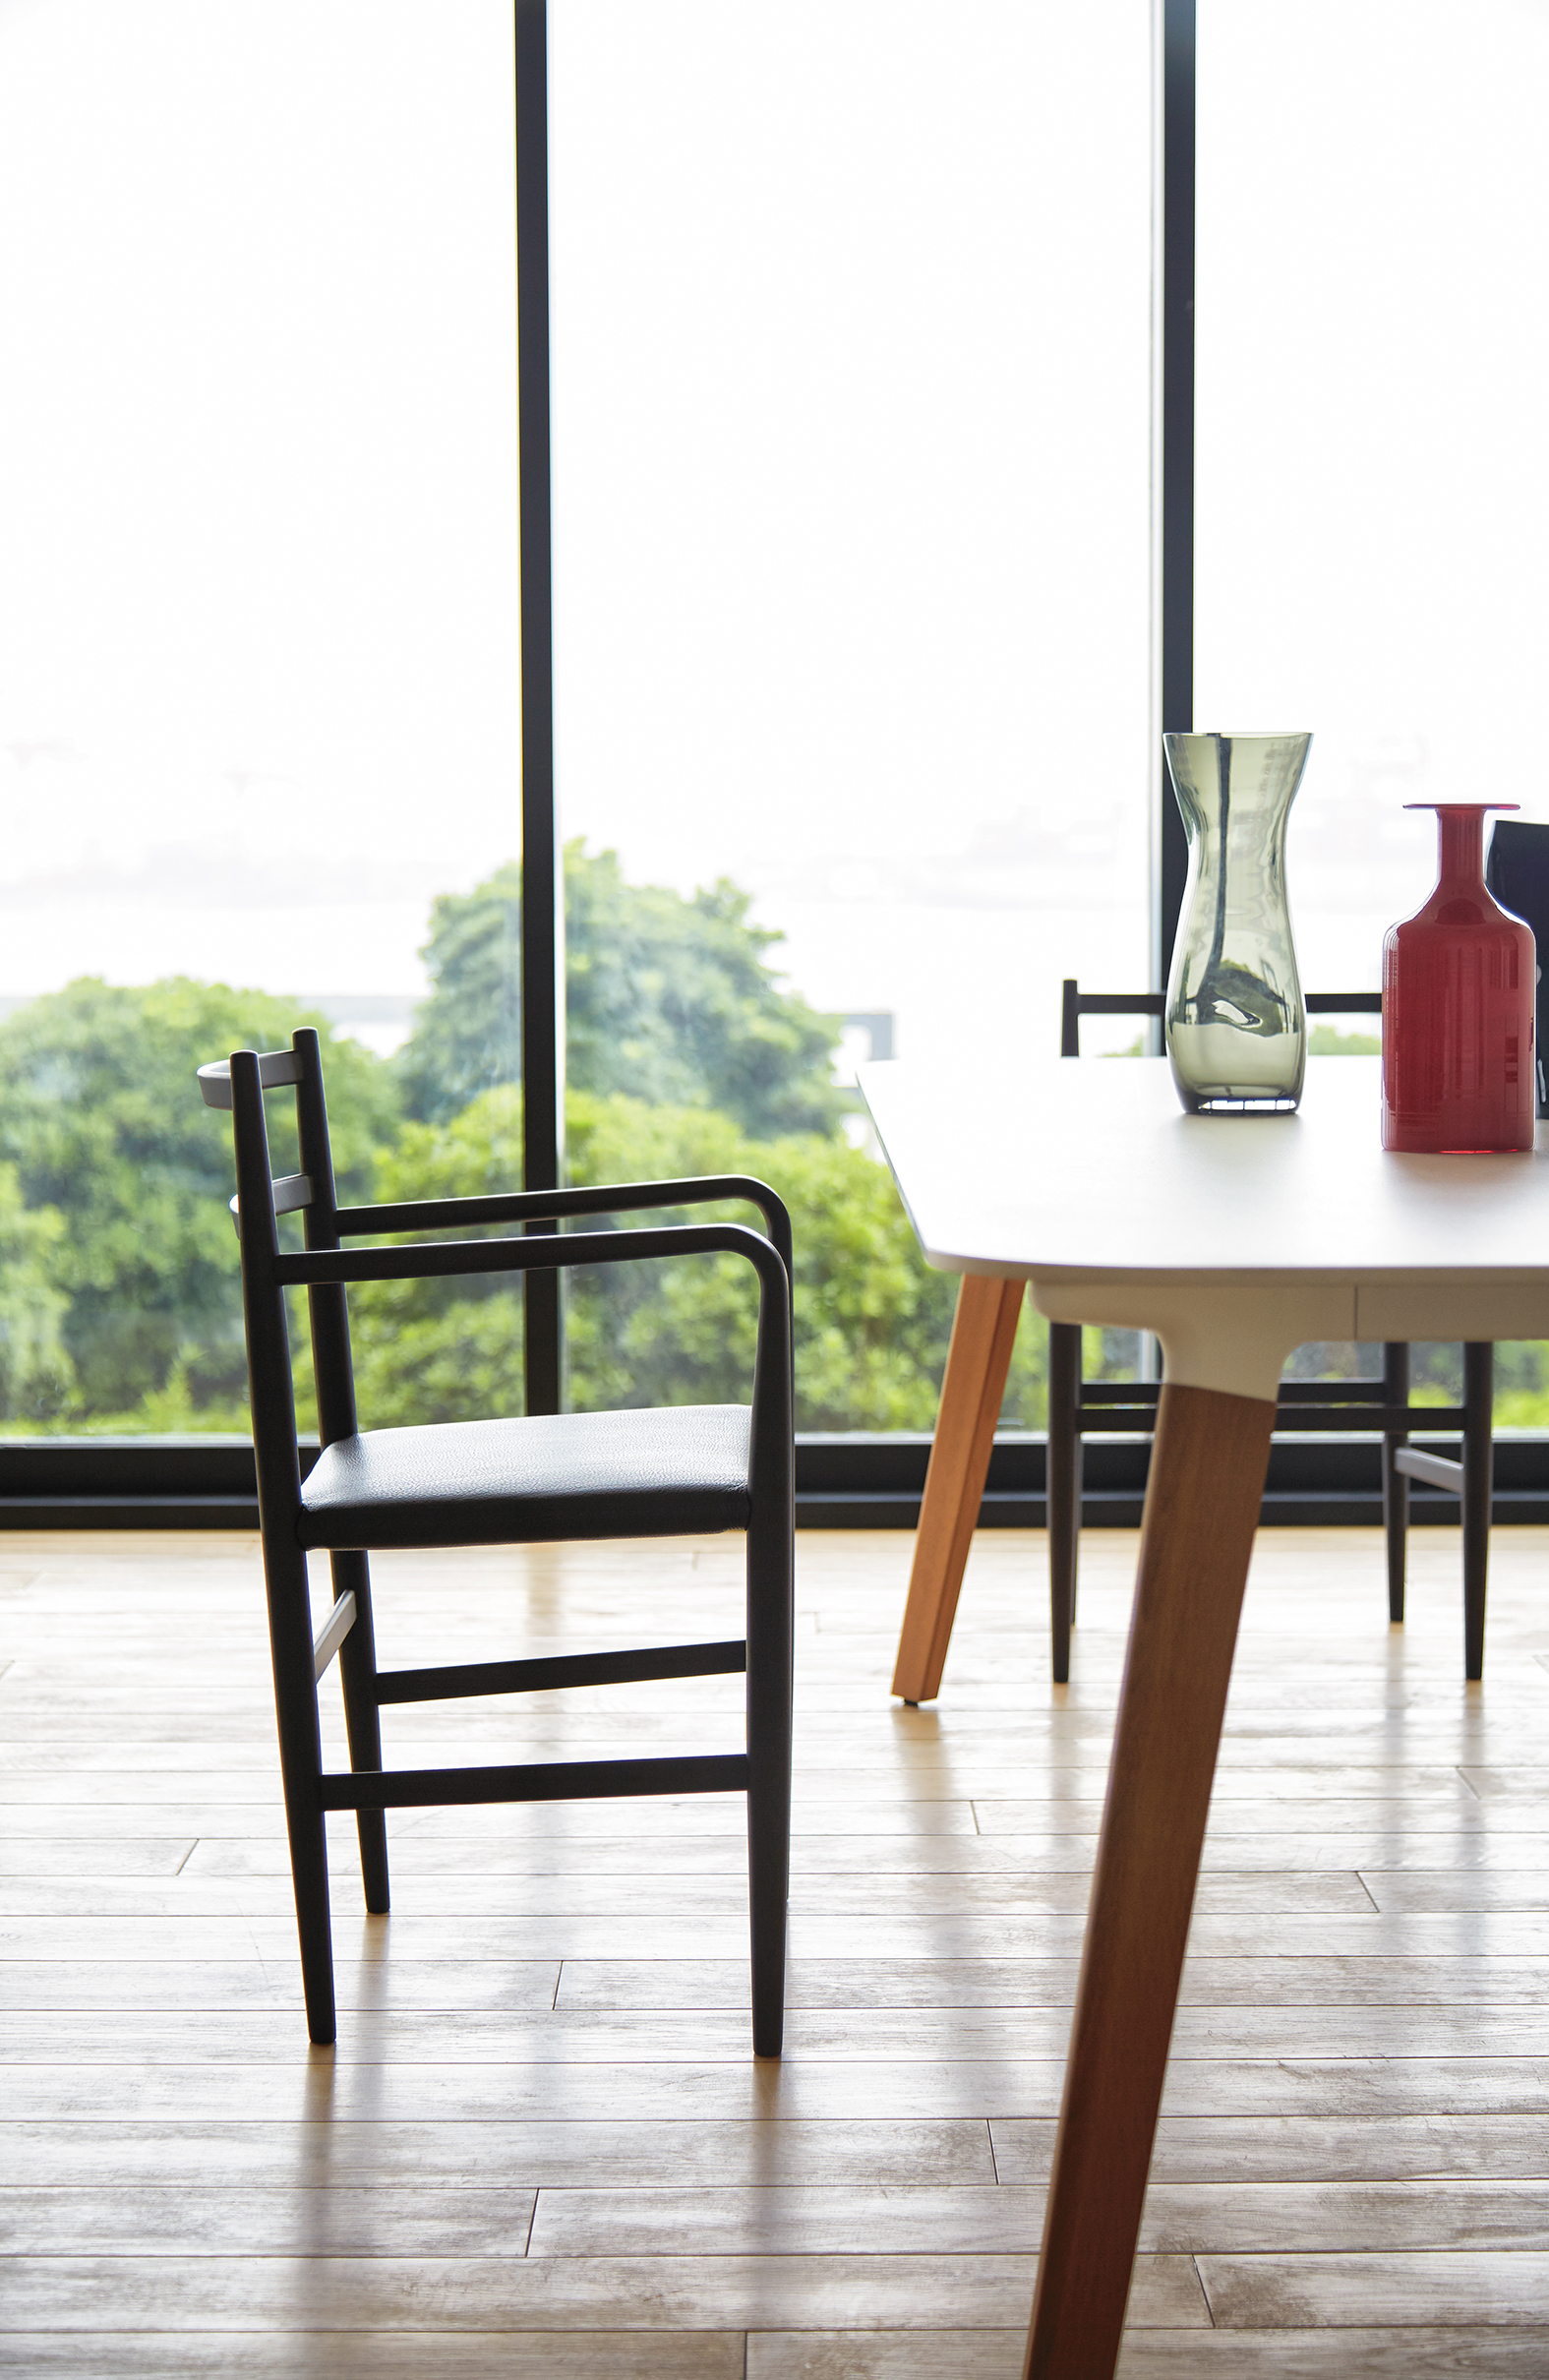 Root Chairs by Jin Kuramoto for Arflex Japan